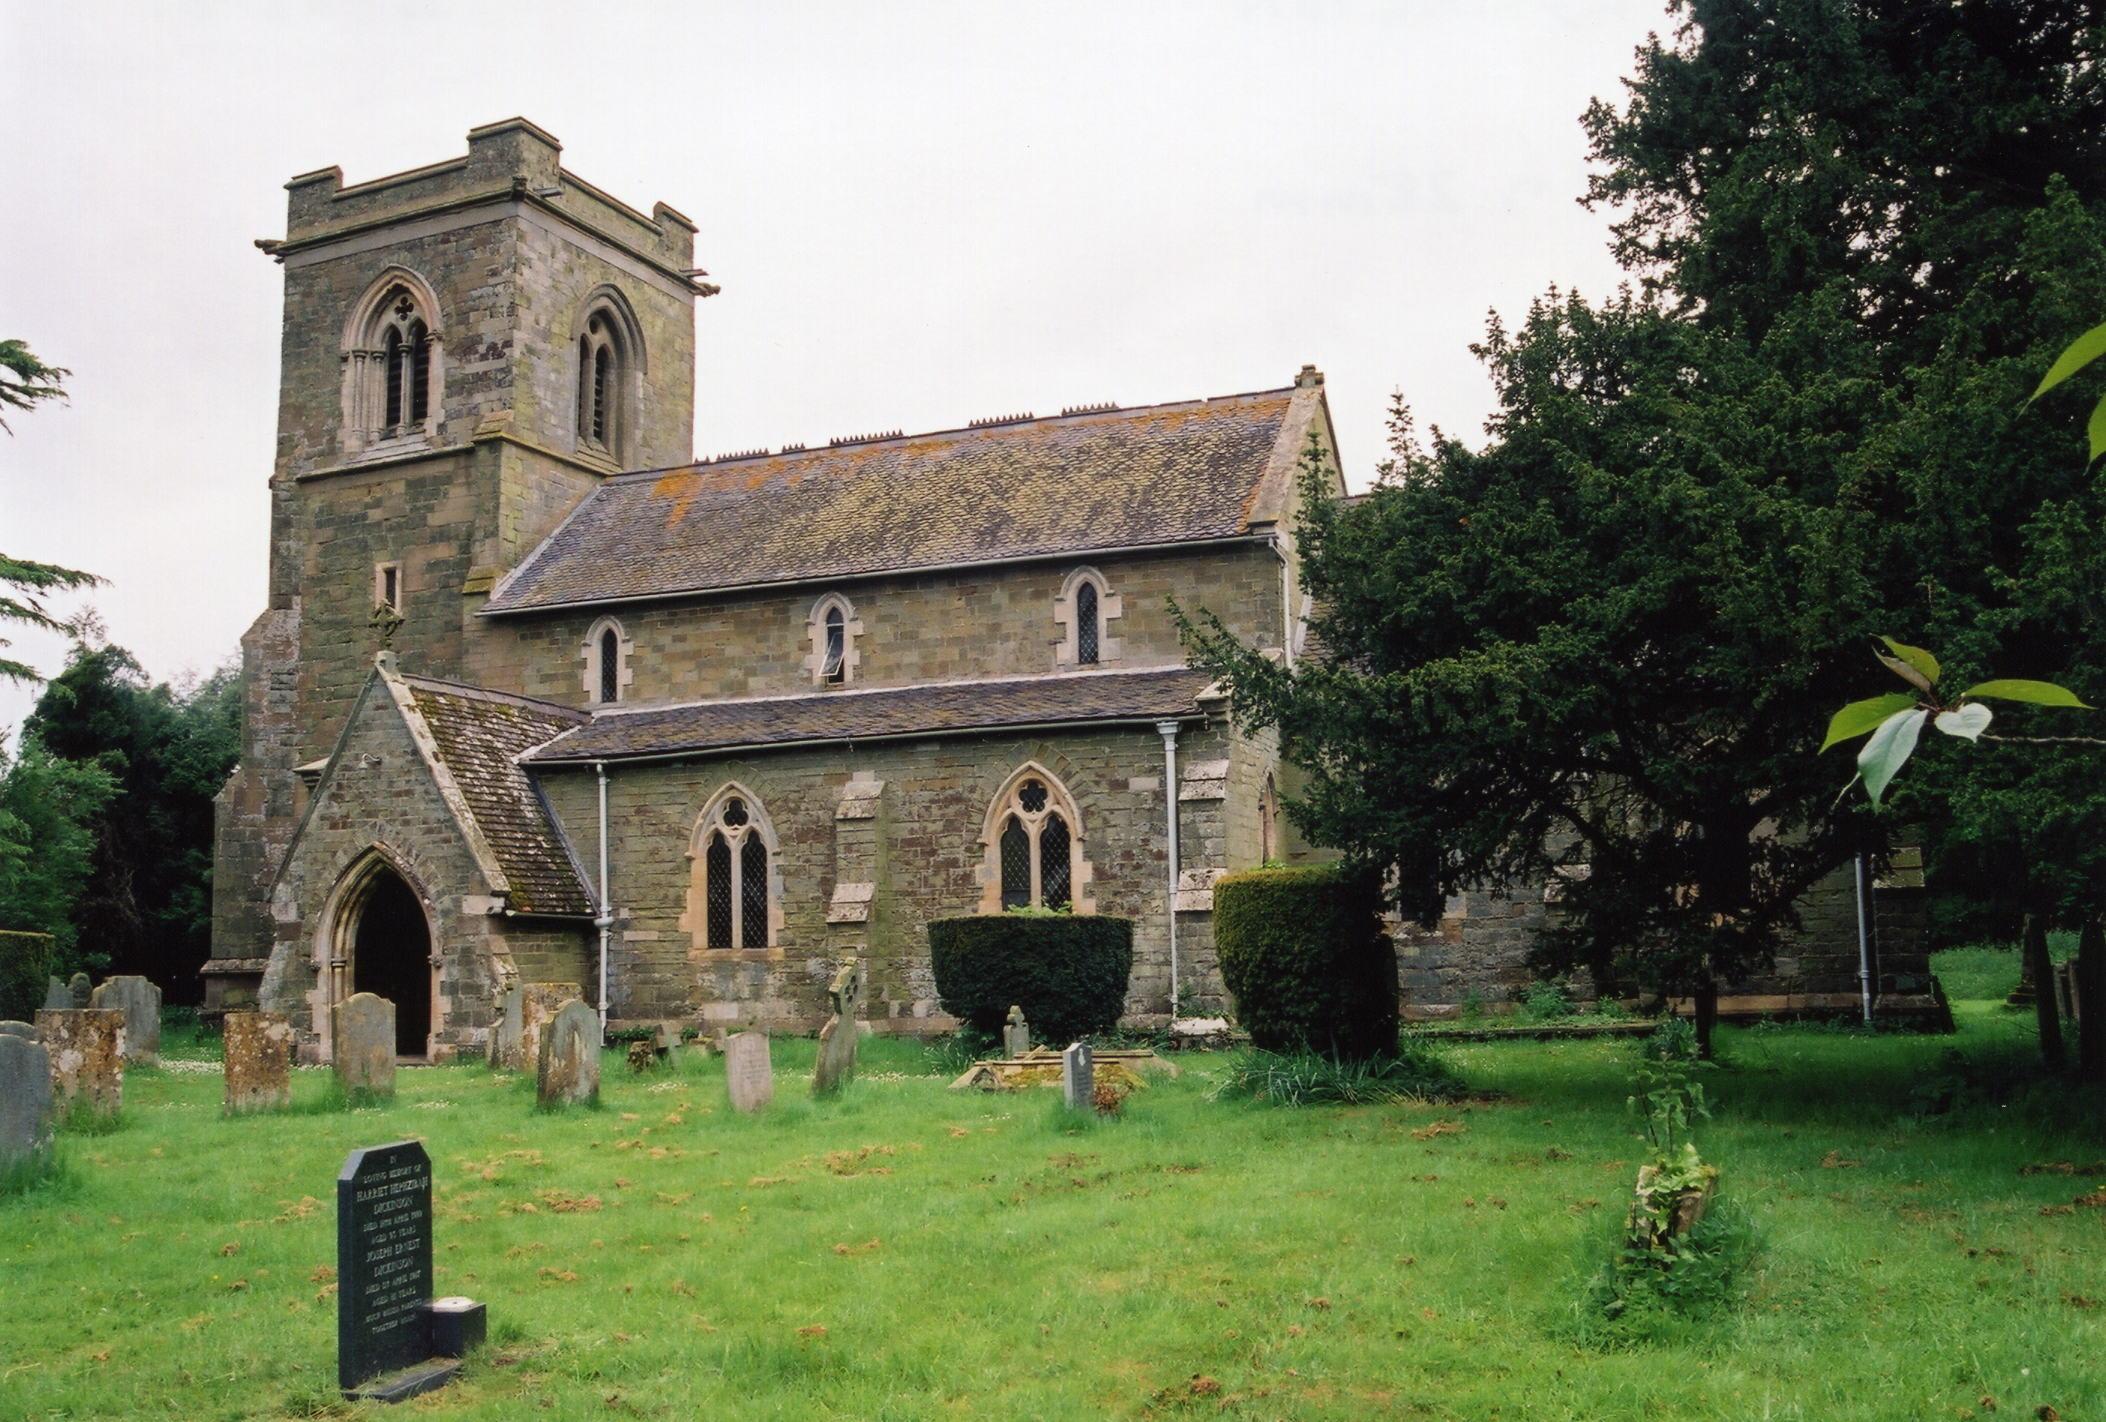 Edlington St. Helen's church